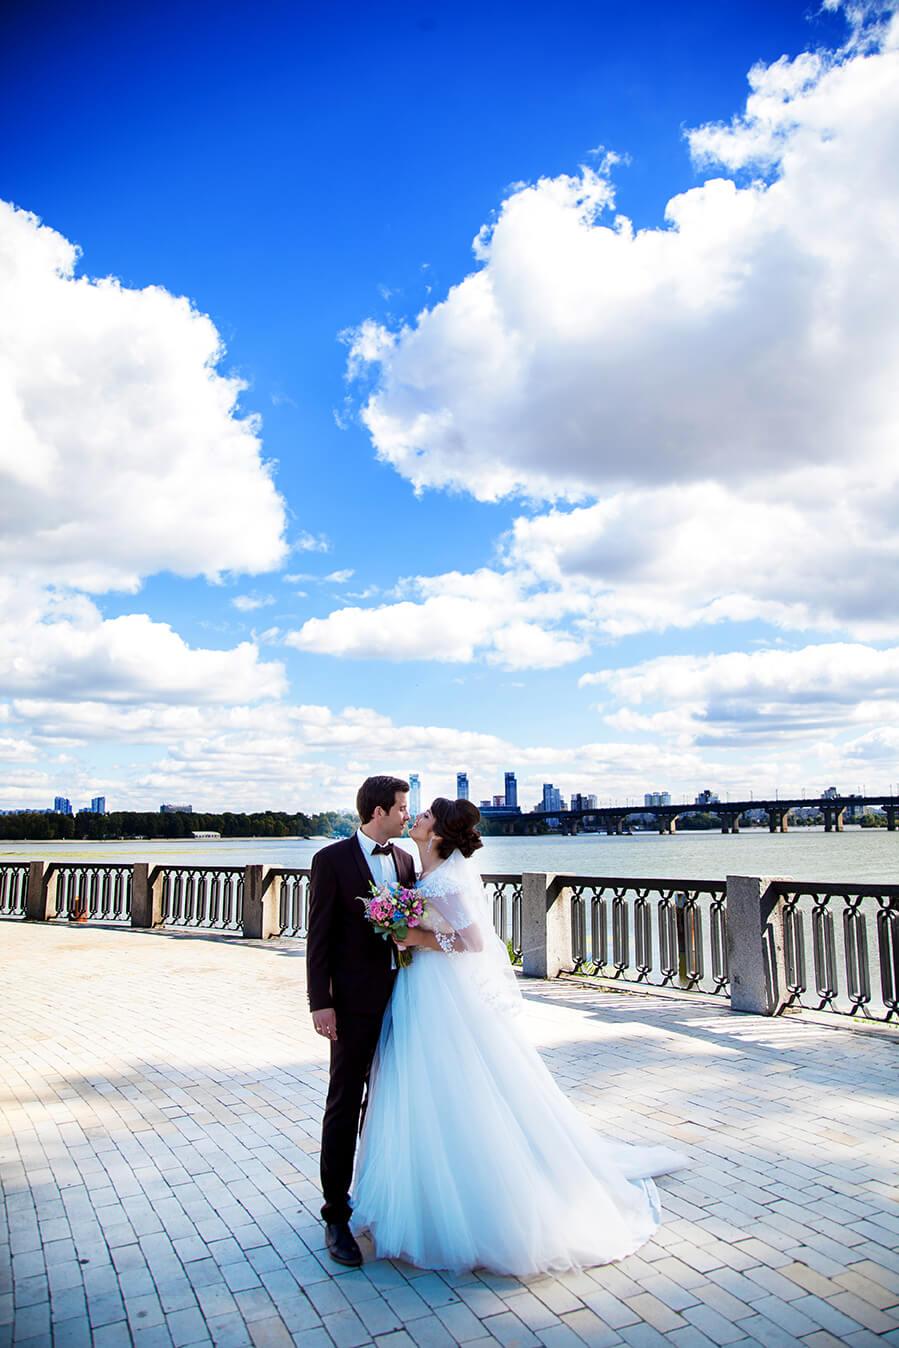 1-svadebnoe-foto-kiev-svadebnaja-progulka-mesta-dlja-svadebnoj-fotosessii-4